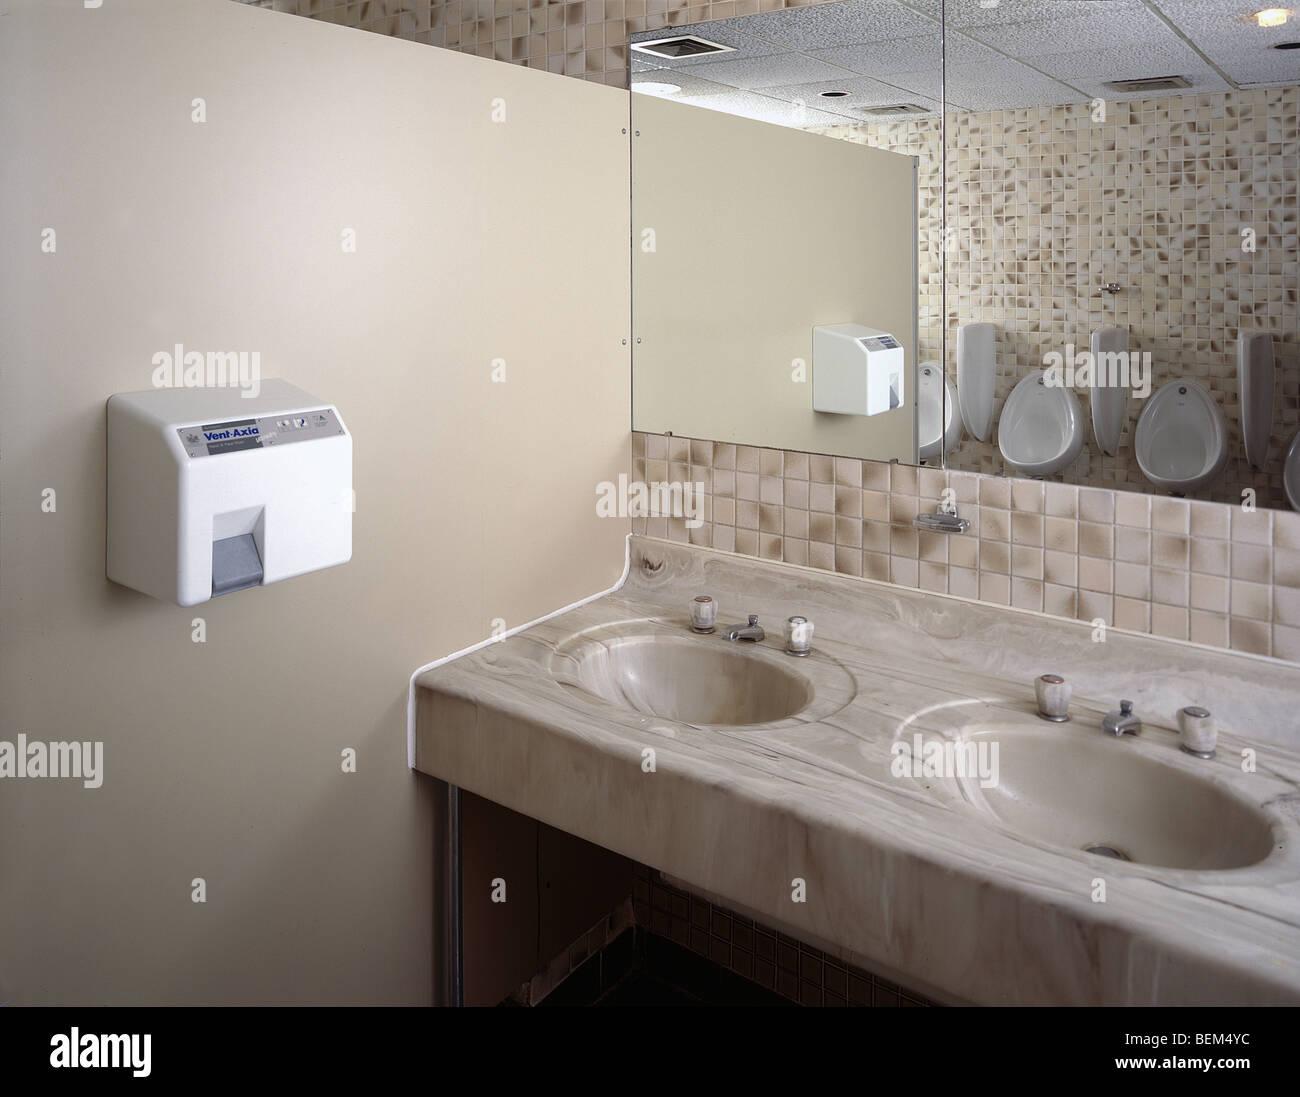 Commercial Bathroom Urinal Design Html on commercial bathroom paper towel dispenser, commercial bathroom counters, commercial bathroom sinks, commercial bathroom vanity units, commercial bathroom stalls, commercial bathroom partitions, commercial bathroom vanity tops, commercial bathroom showers,